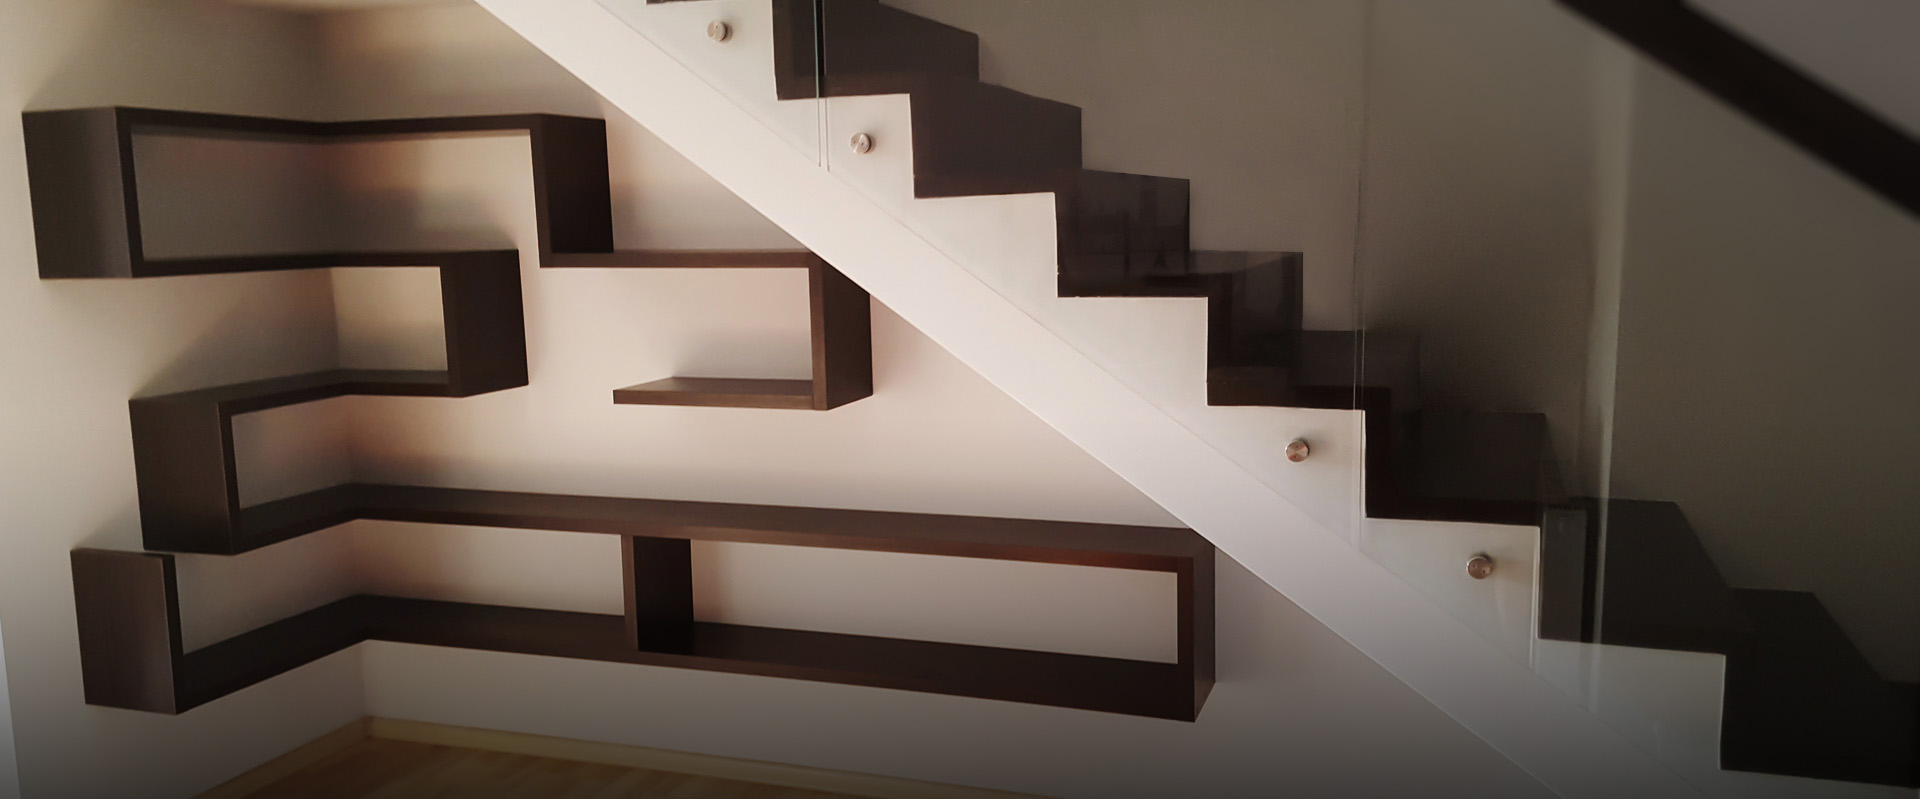 Półka pod schodami